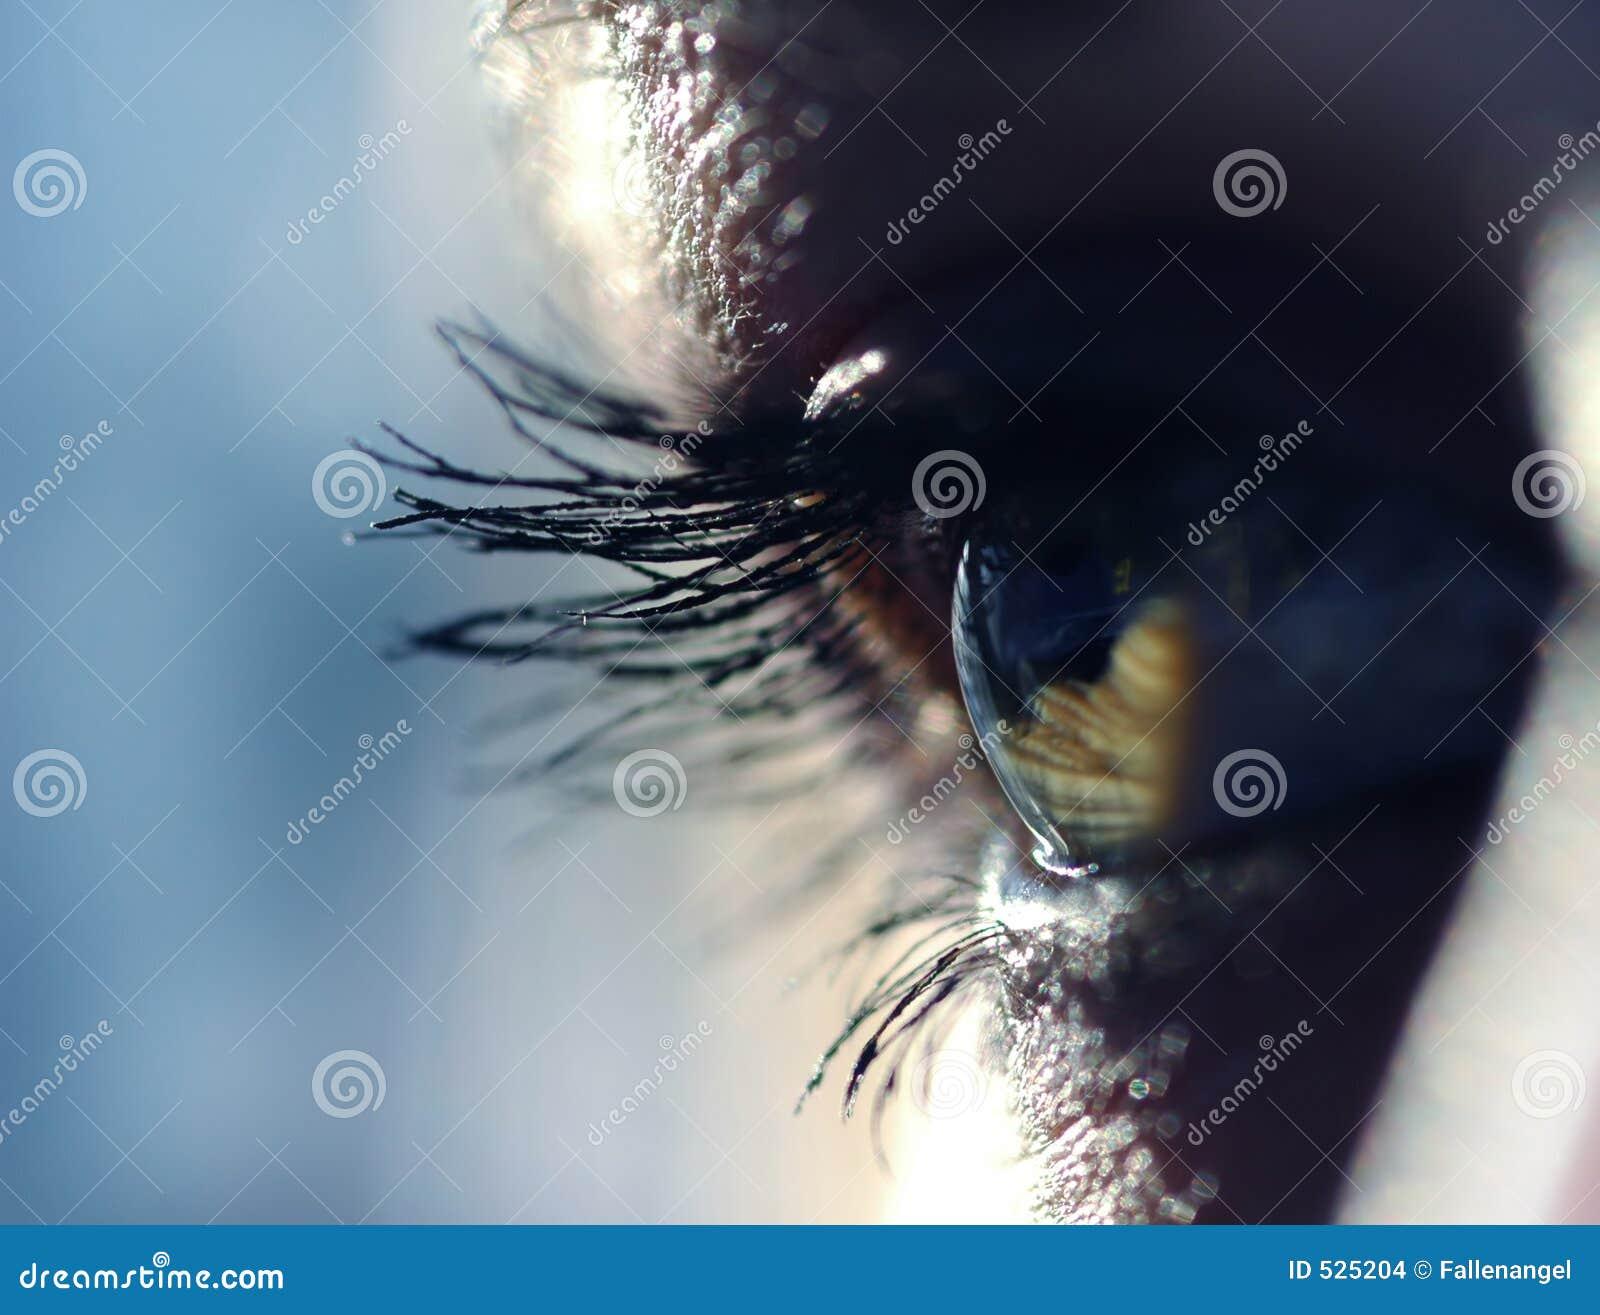 Download 眼睛 库存照片. 图片 包括有 角膜, 竹子, 皮肤, 人们, 参见, 数字式, 眼眉, 设计, 学生, 空白 - 525204